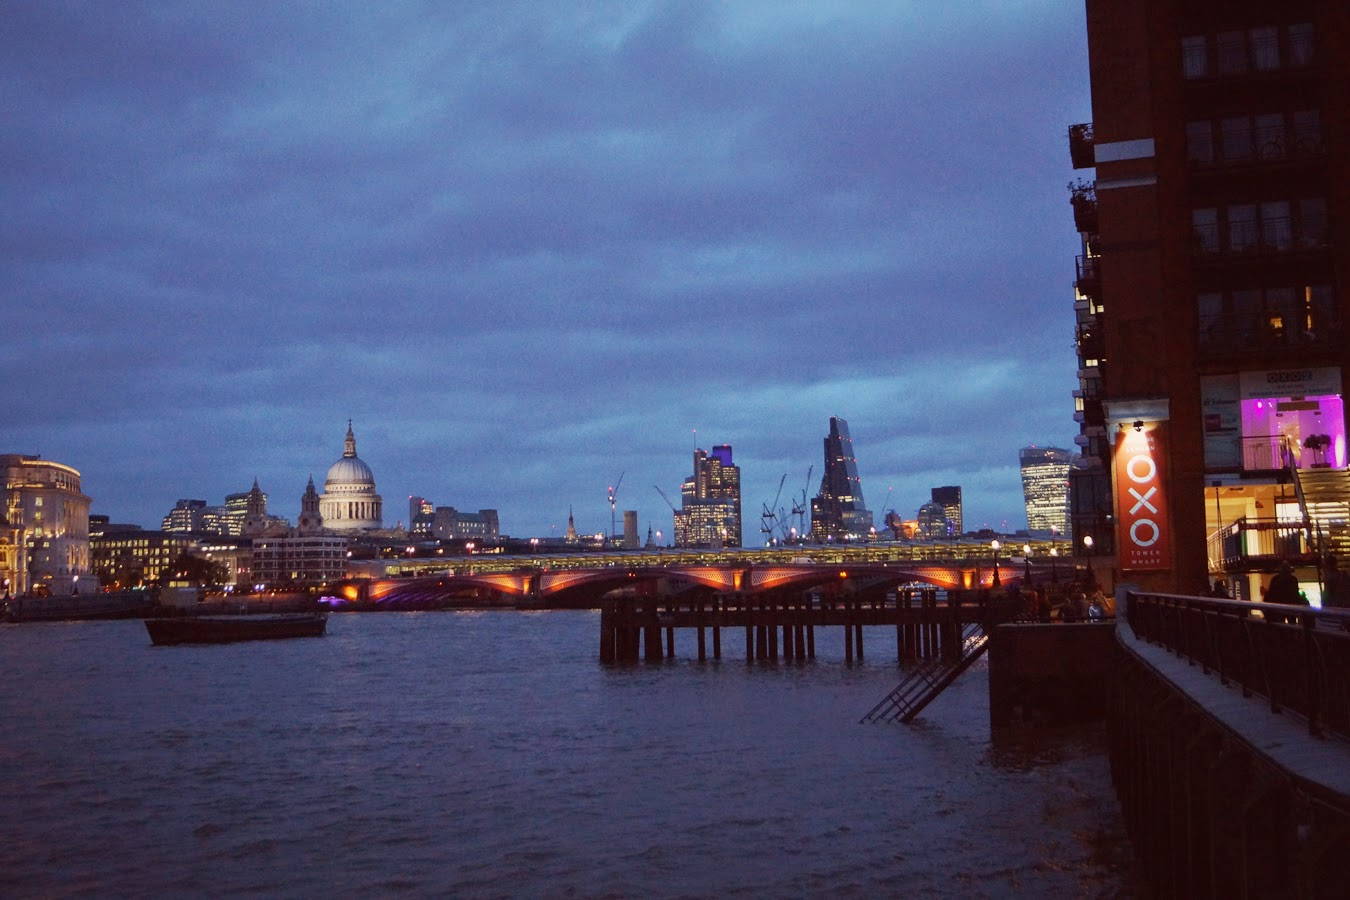 embankment+london+OXO+Tower